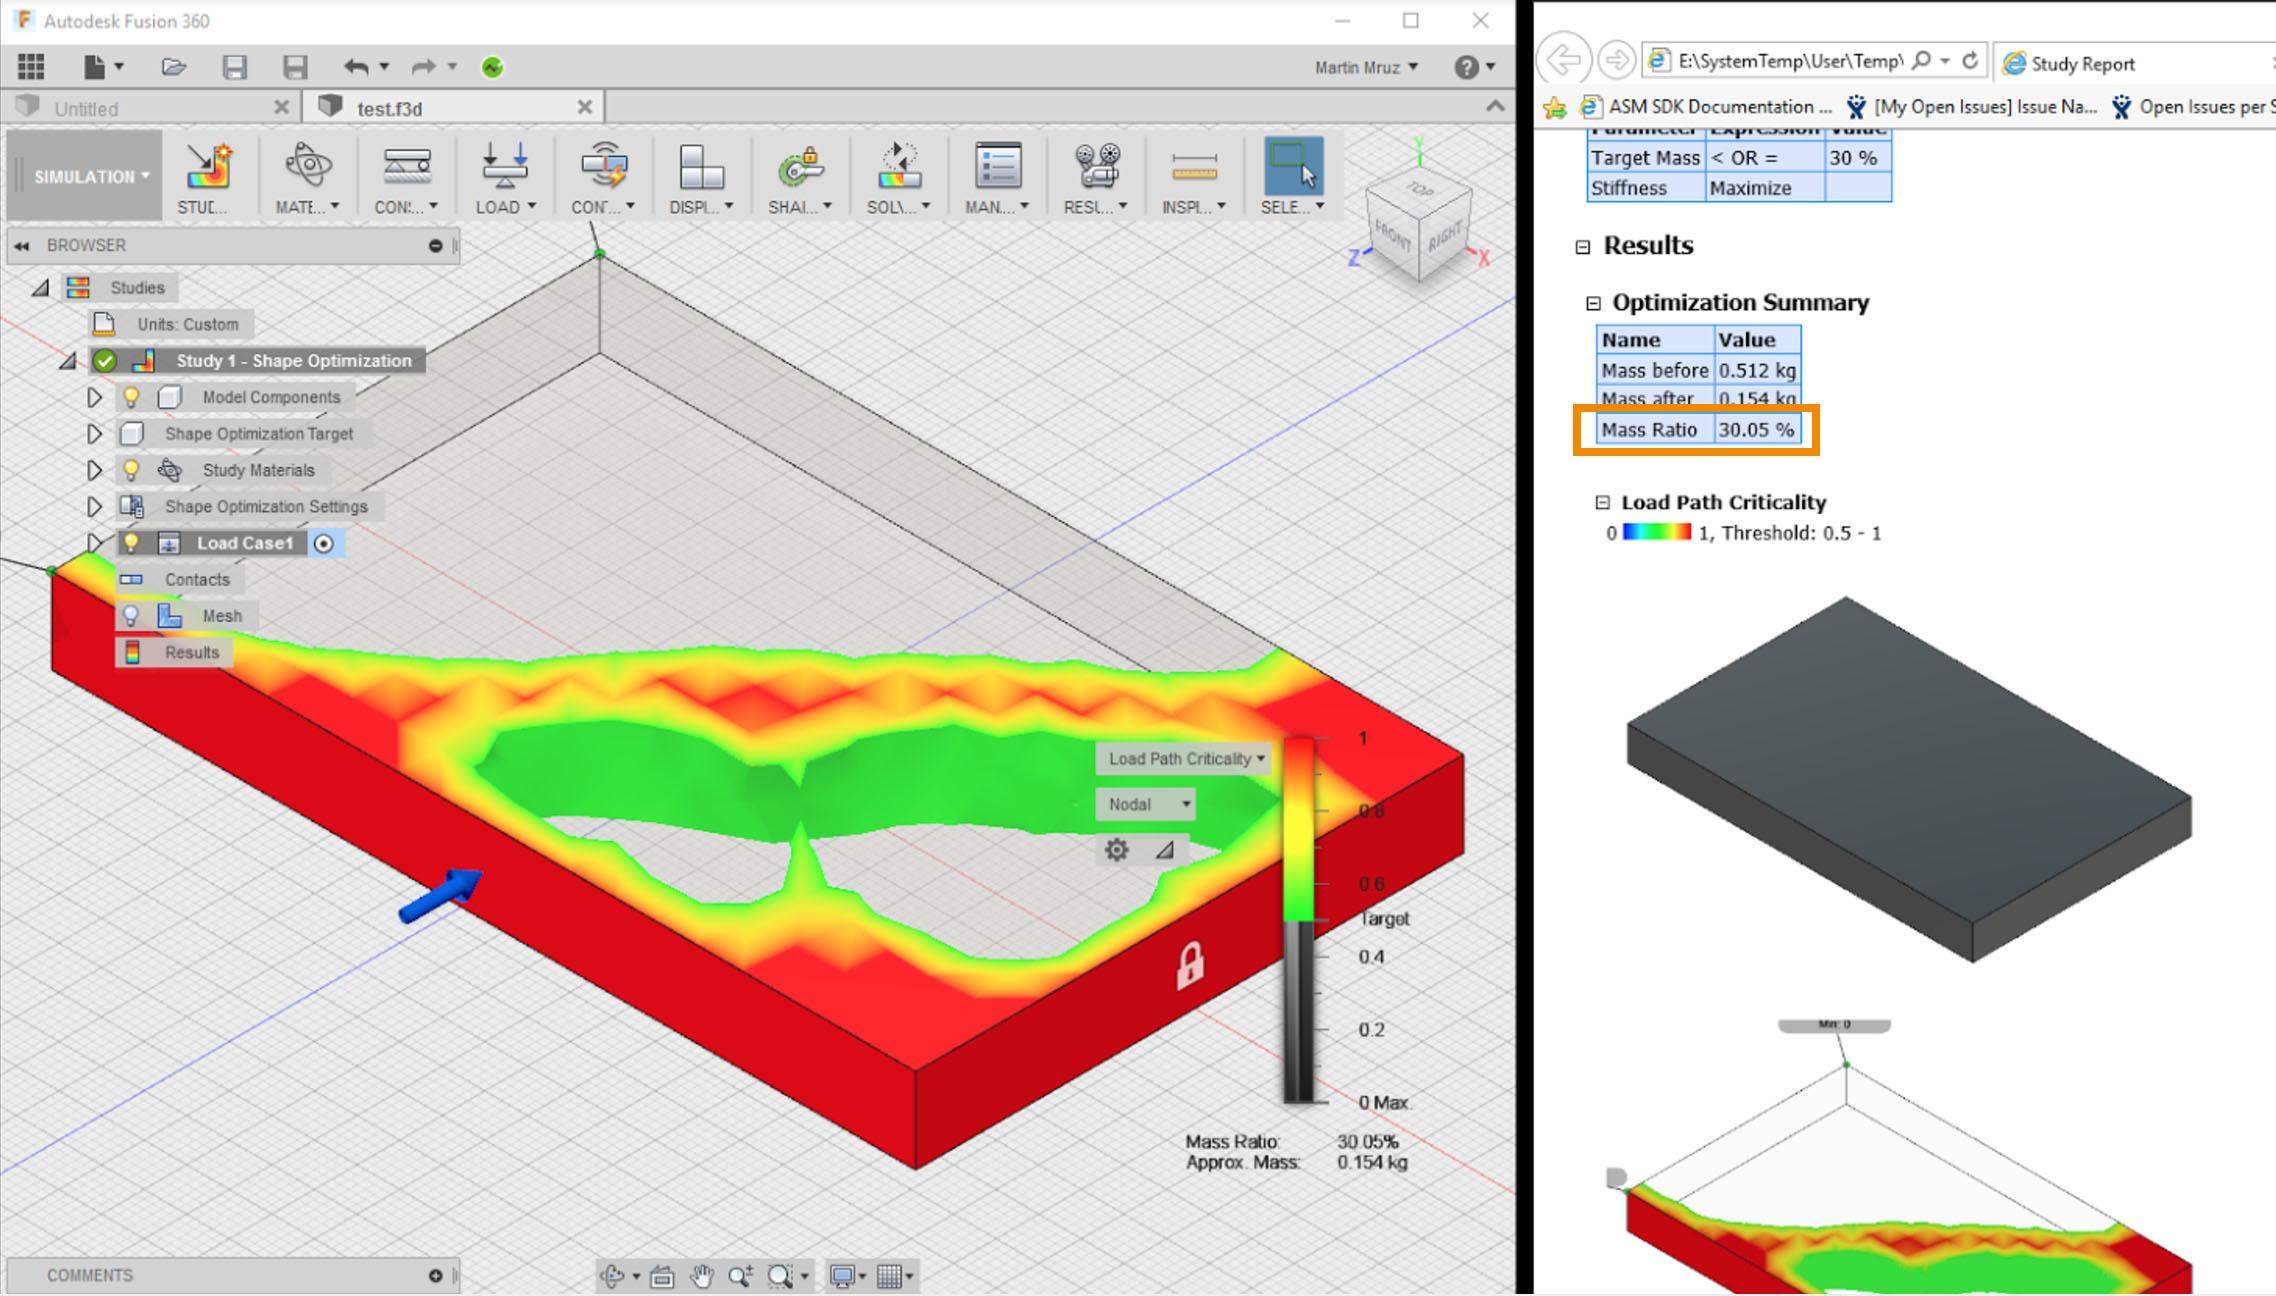 Autodesk Fusion 360 mass_ratio